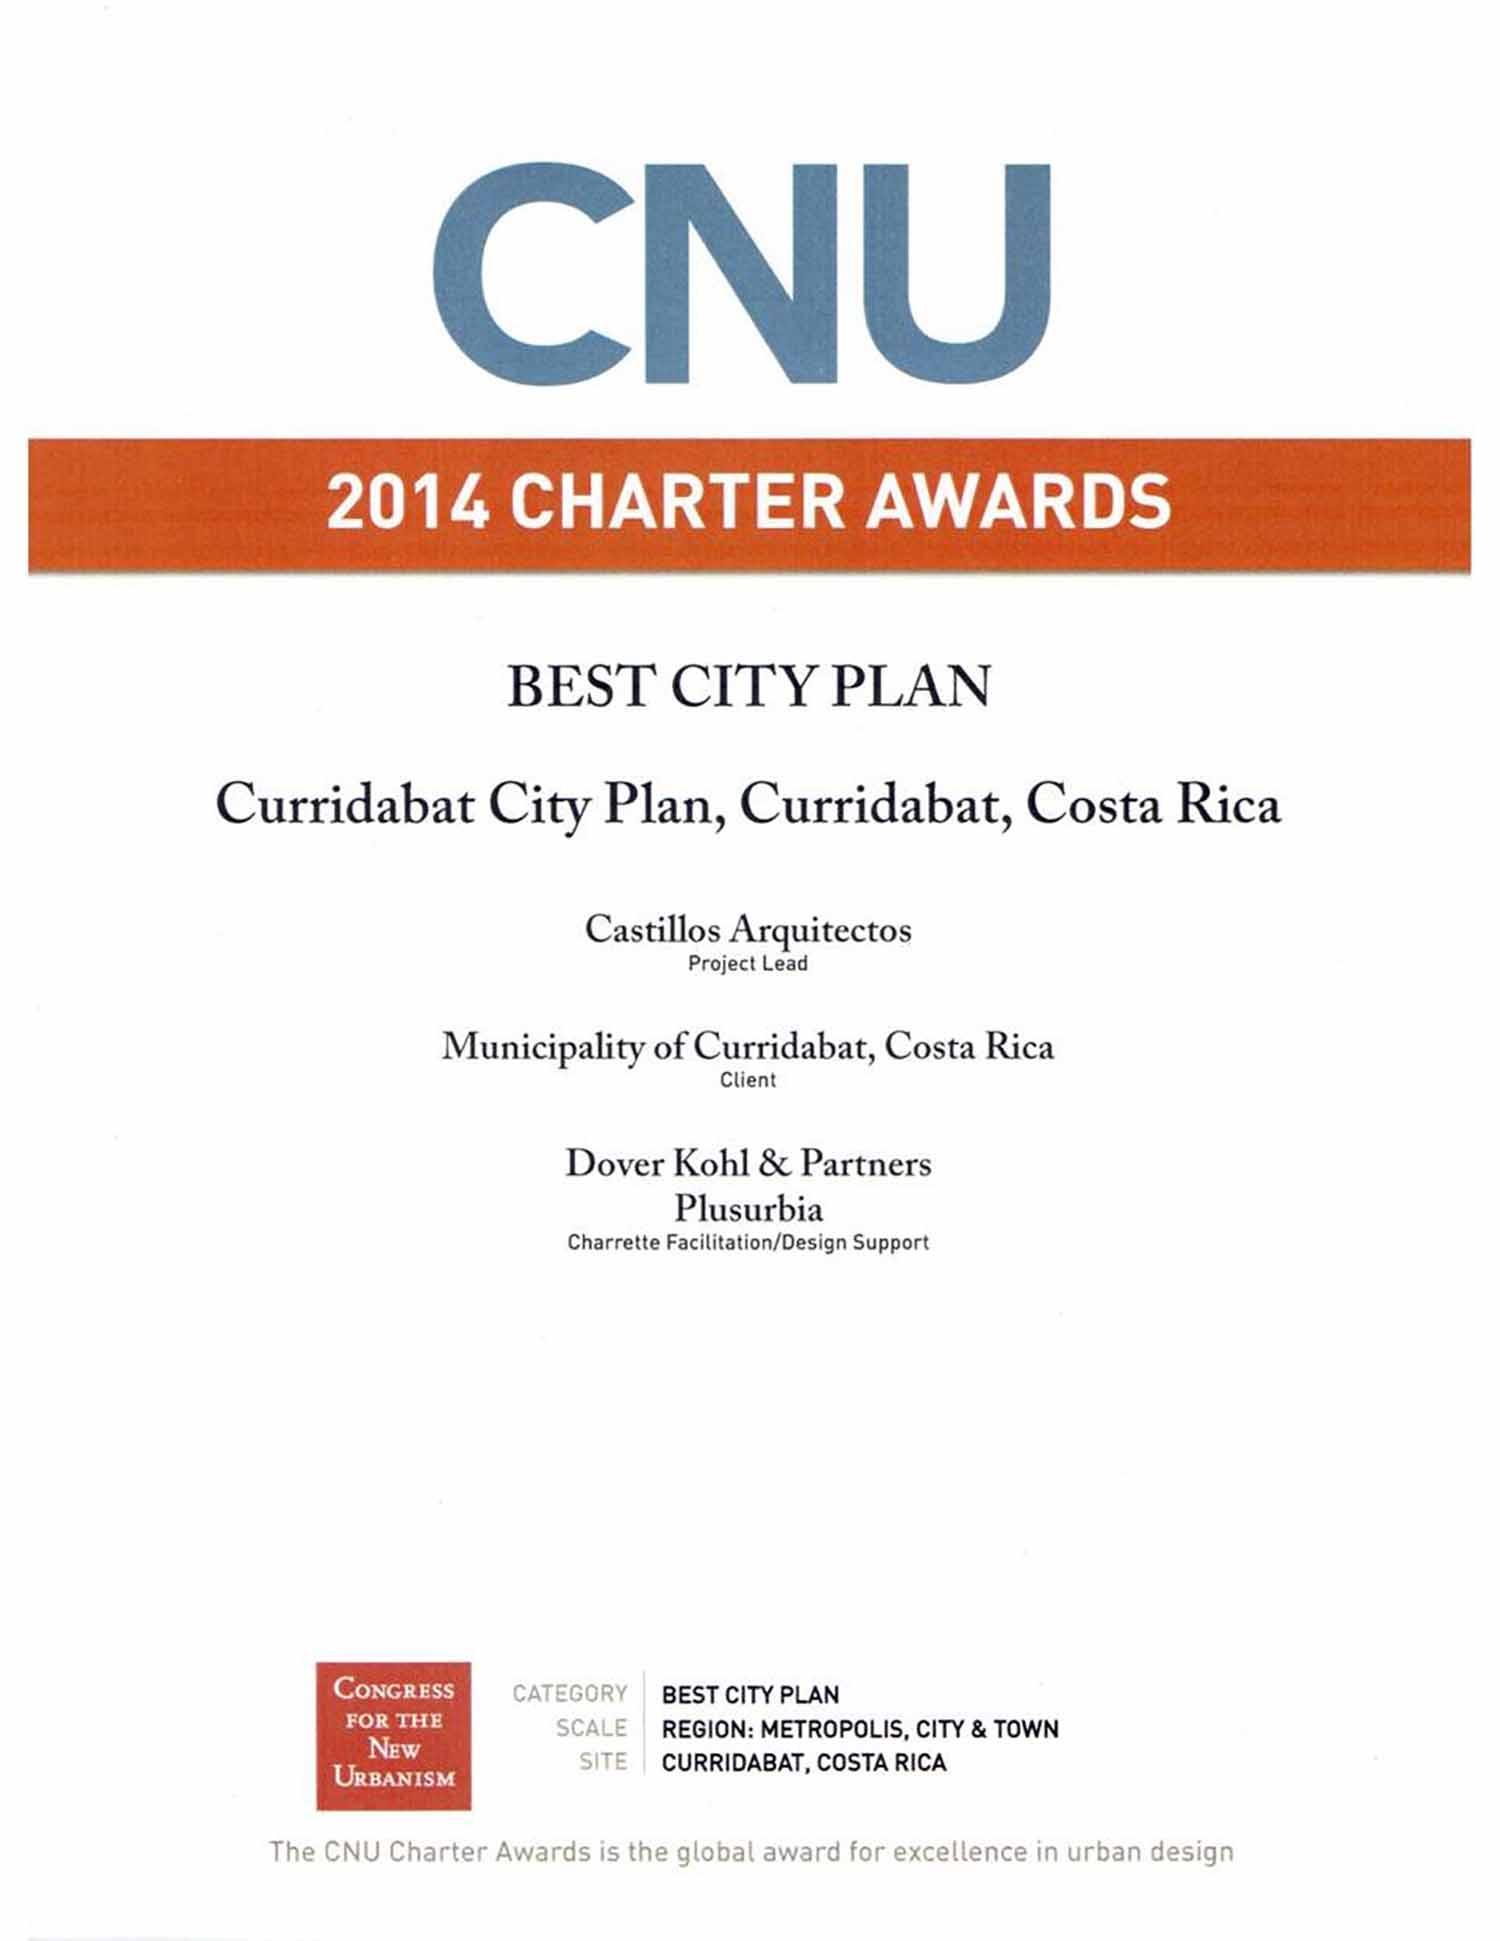 2014-Best City Plan CNU Charter Award-Curridabat Master Plan with Castillo Arquitectos.jpg